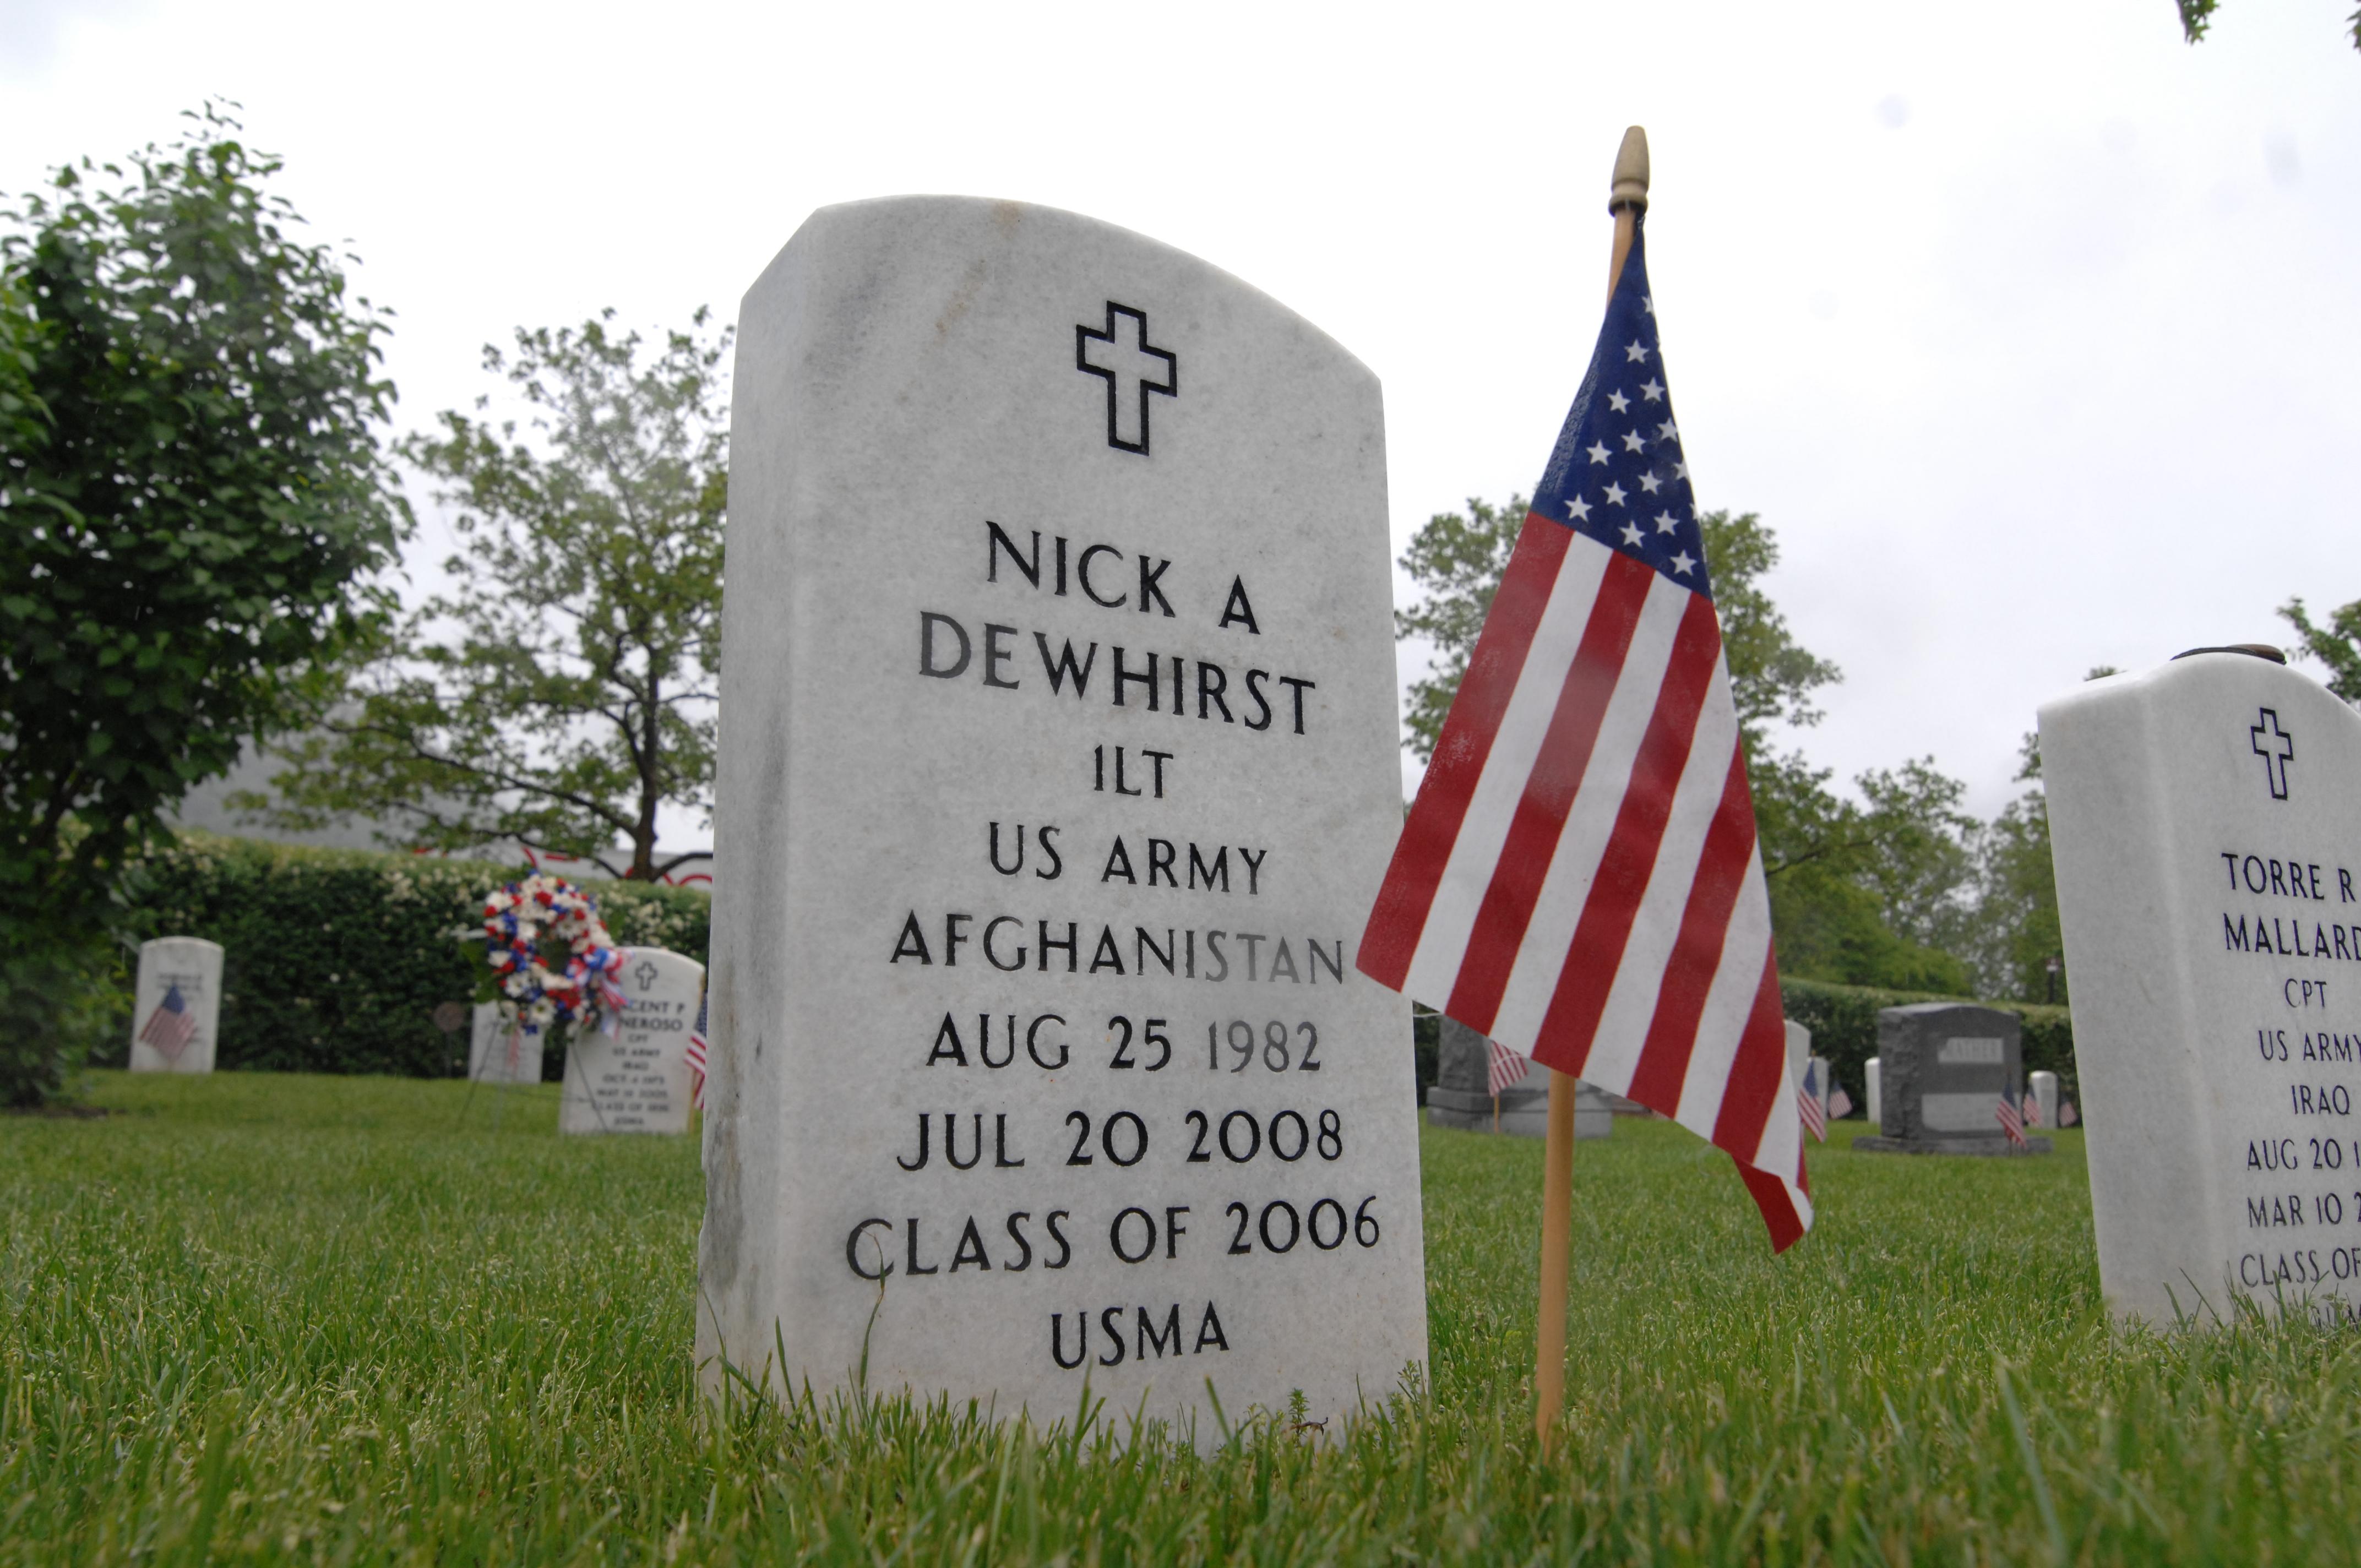 363-Nick-11